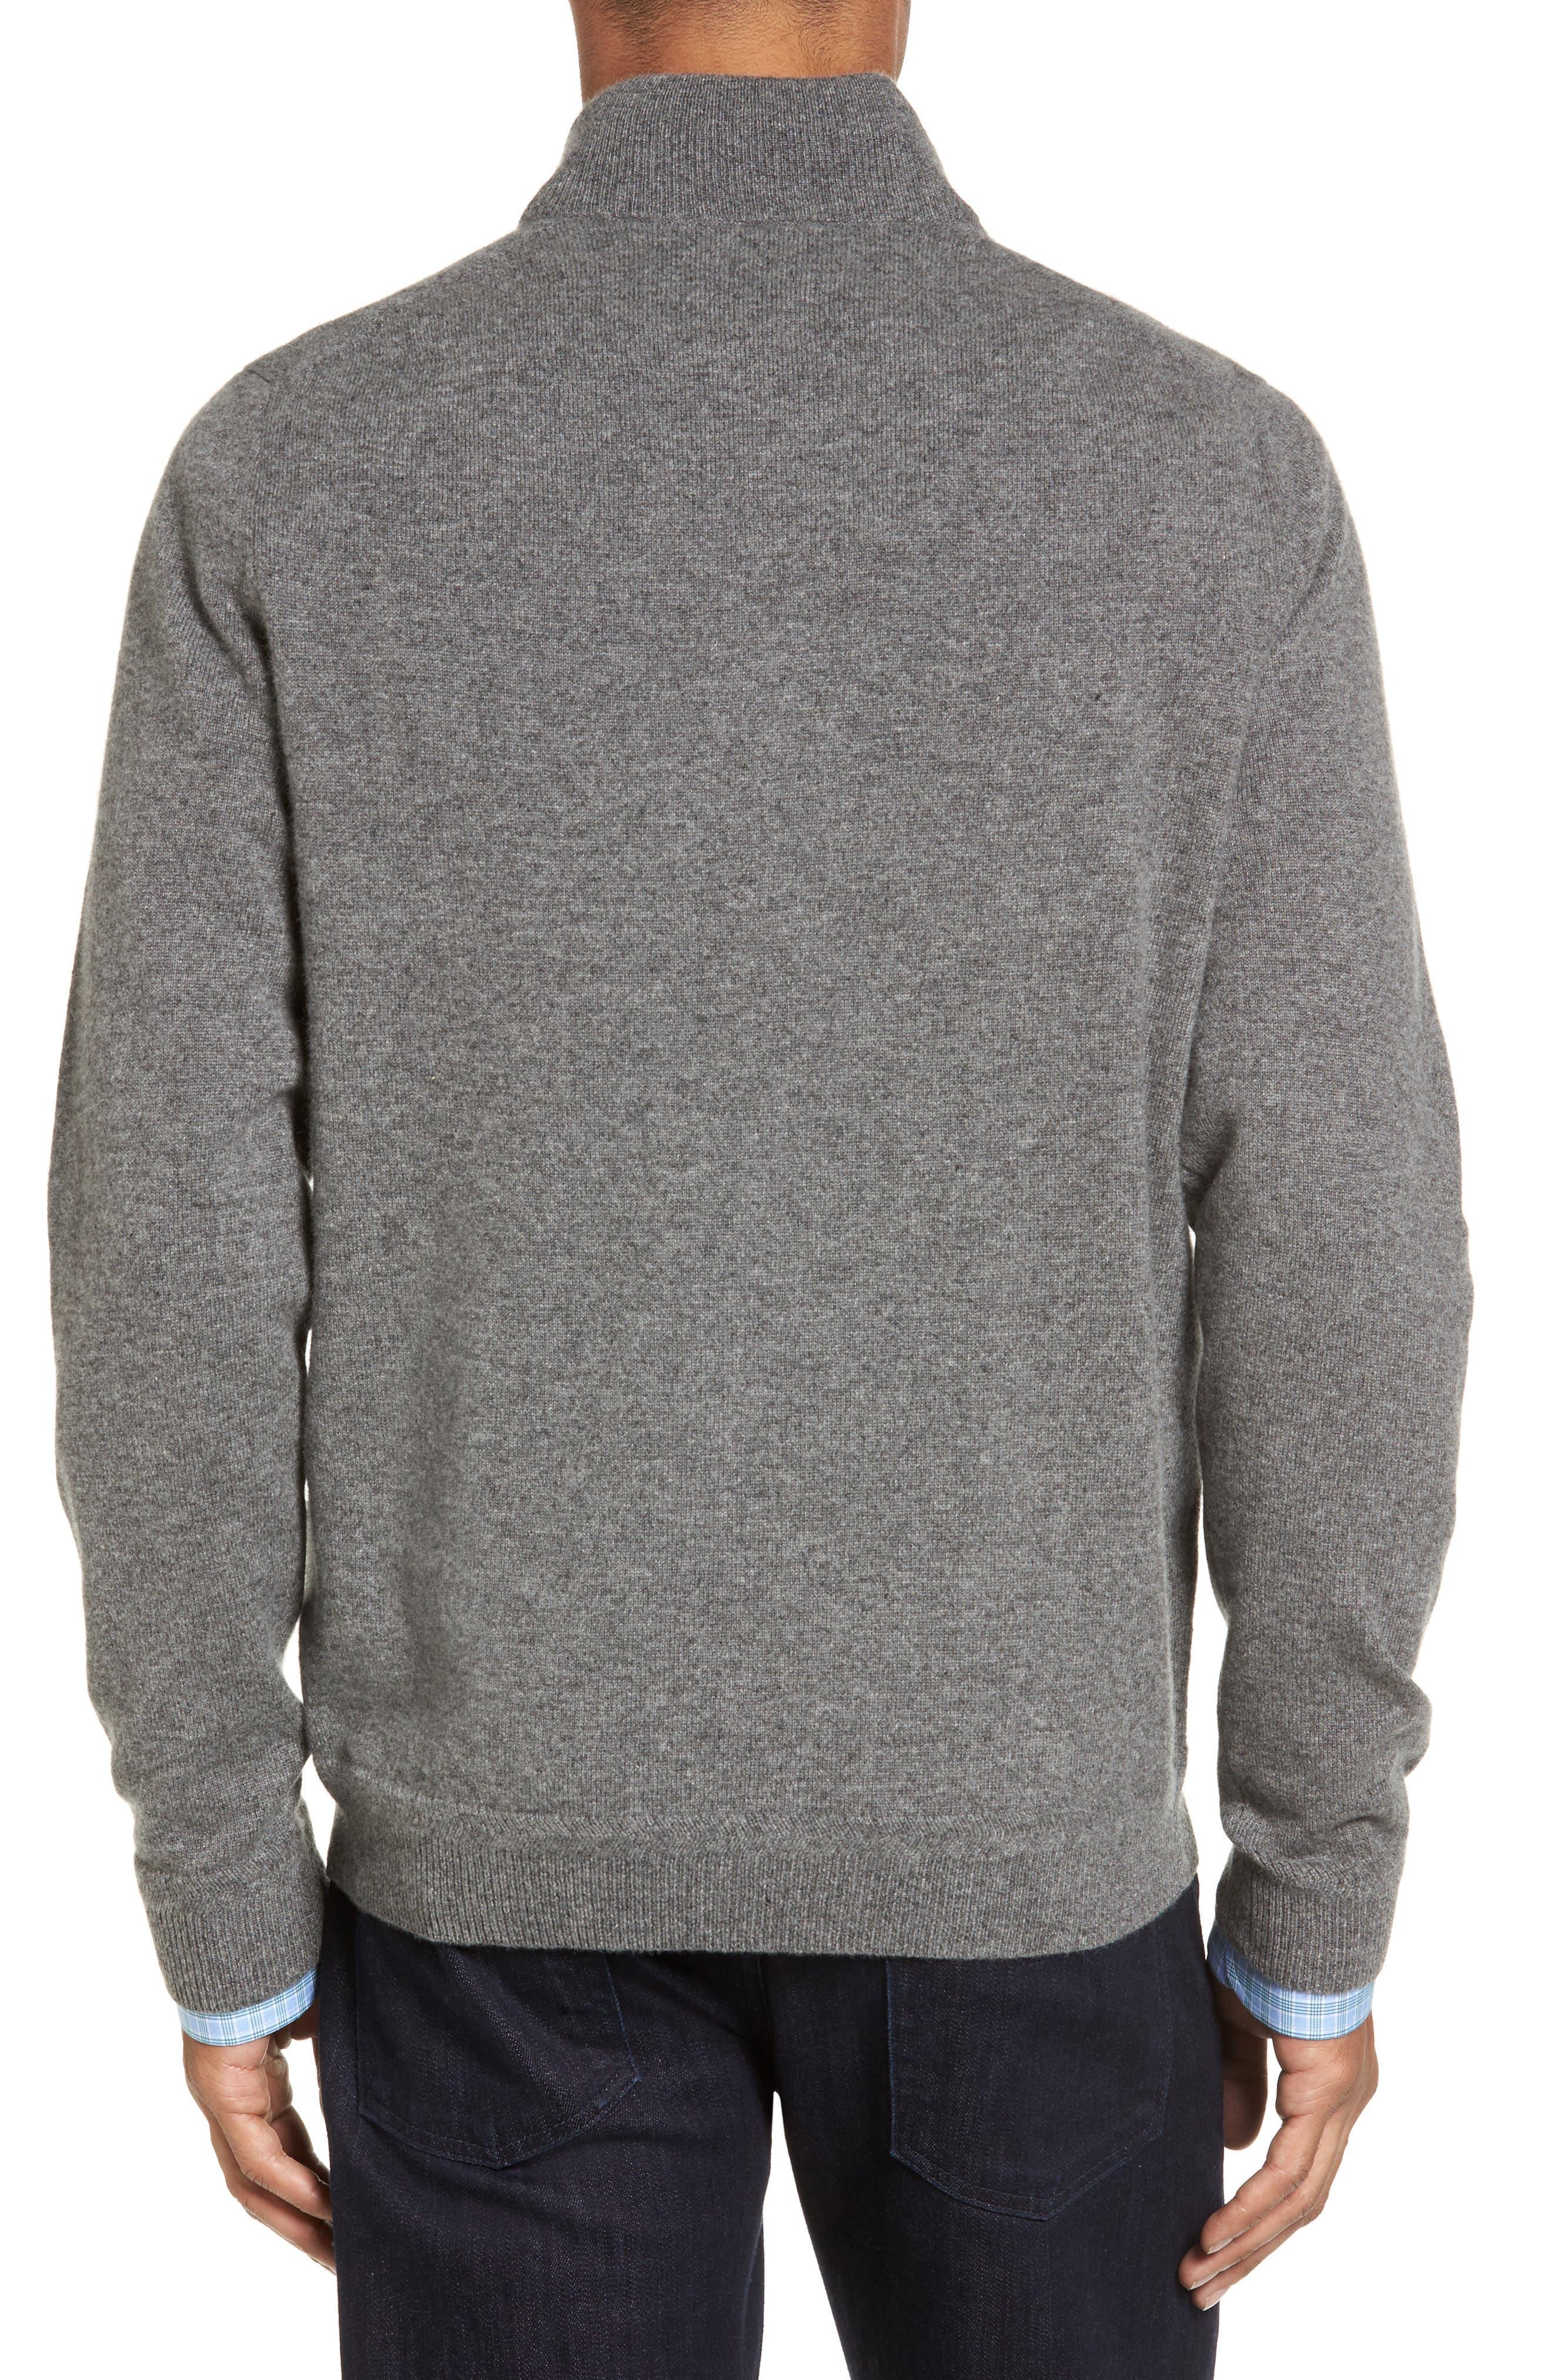 Alternate Image 2  - John W. Nordstrom® Quarter Zip Cashmere Sweater (Regular & Tall)